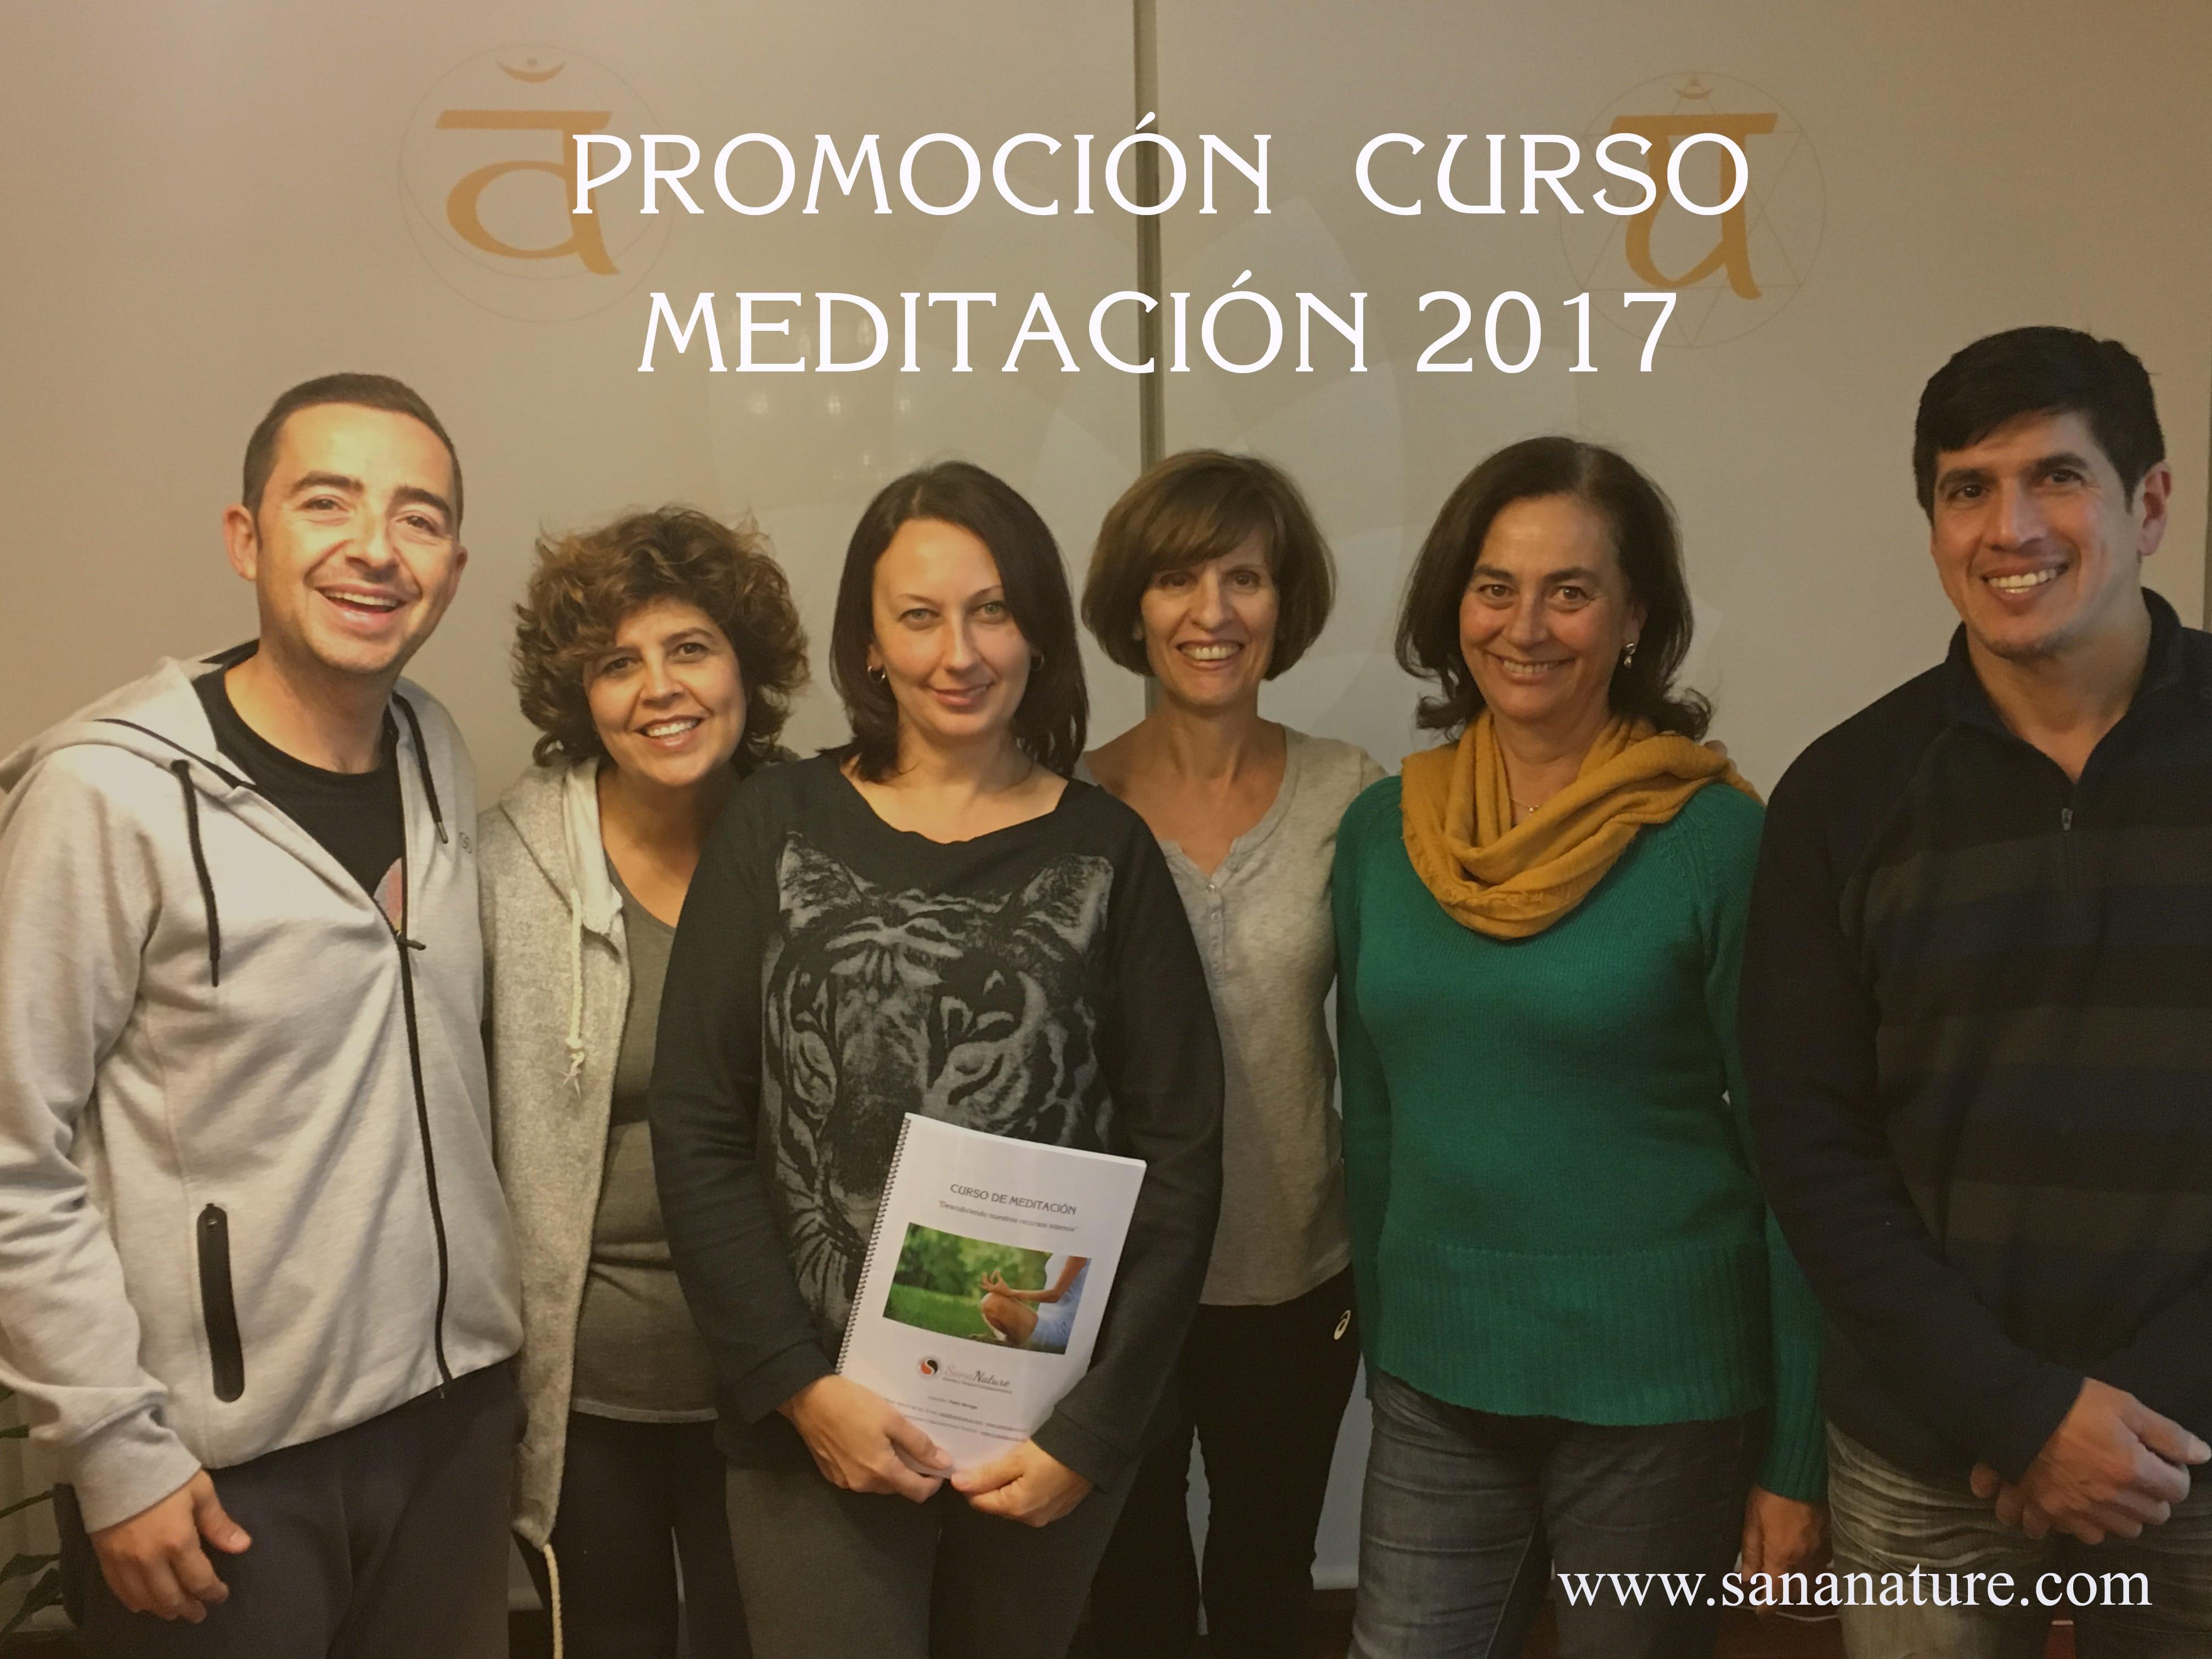 Meditación Galapagar (Sierra Madrid)